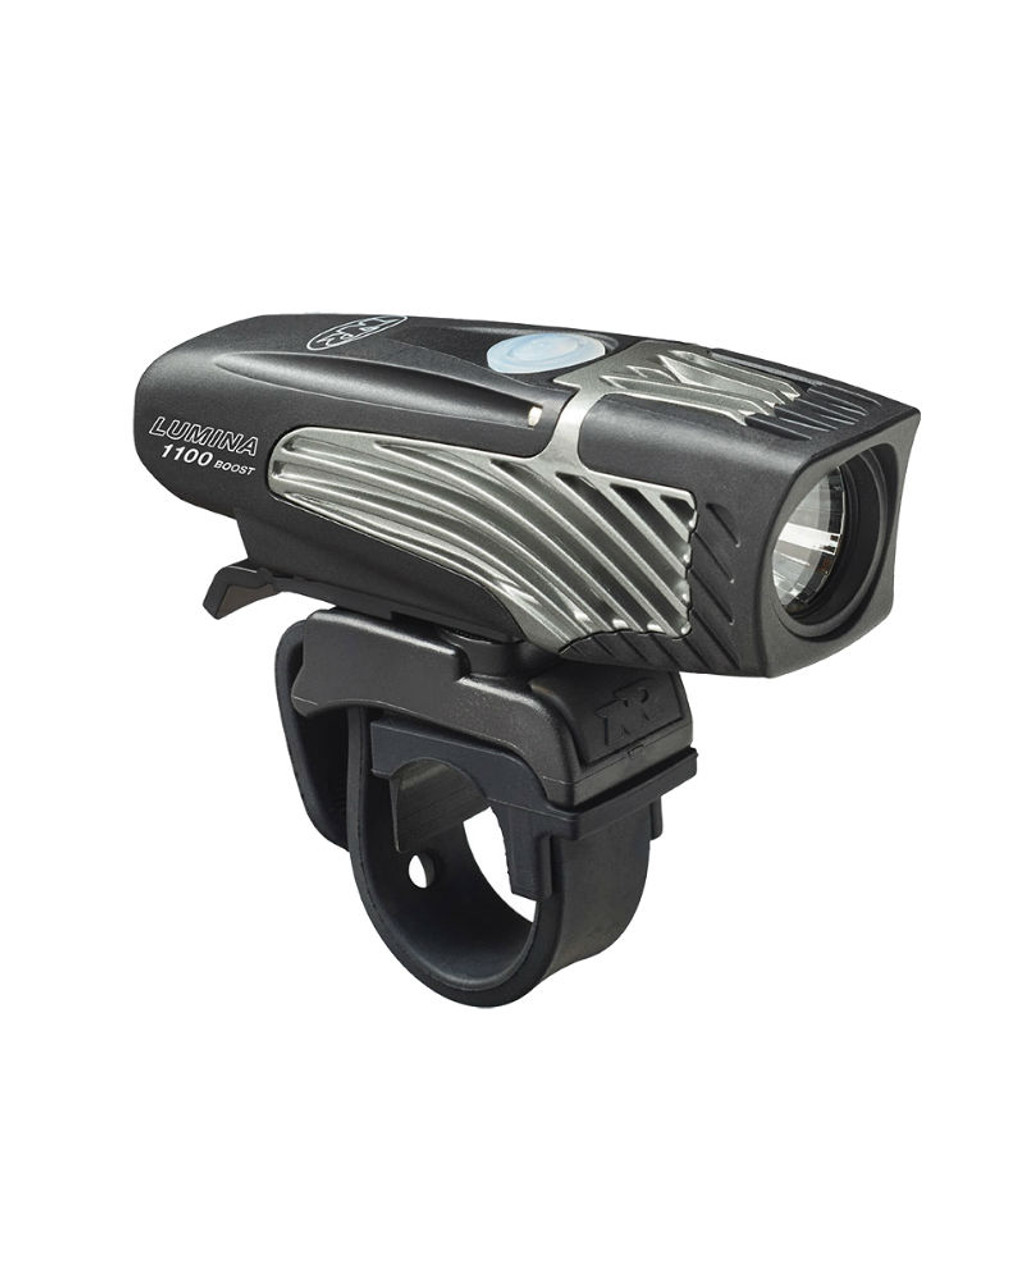 Niterider Lumina Micro 650 Lumens Cree LED Bicycle Headlight USB Rechargeable